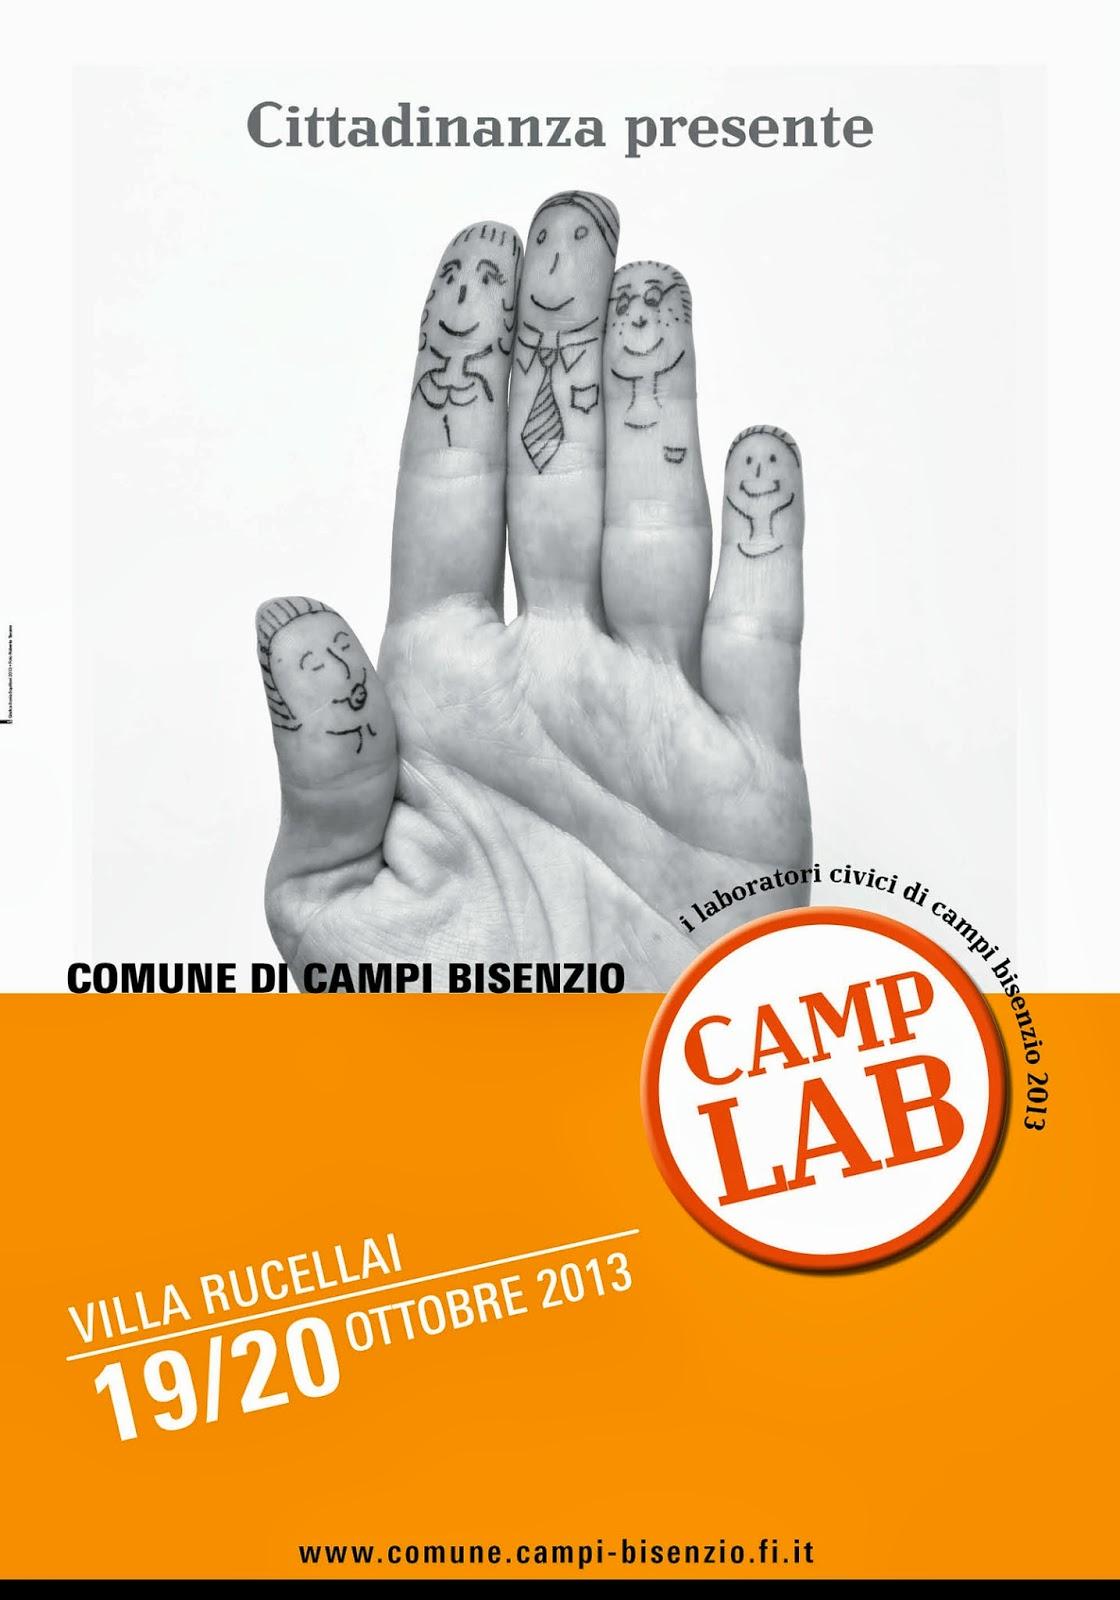 CampLab